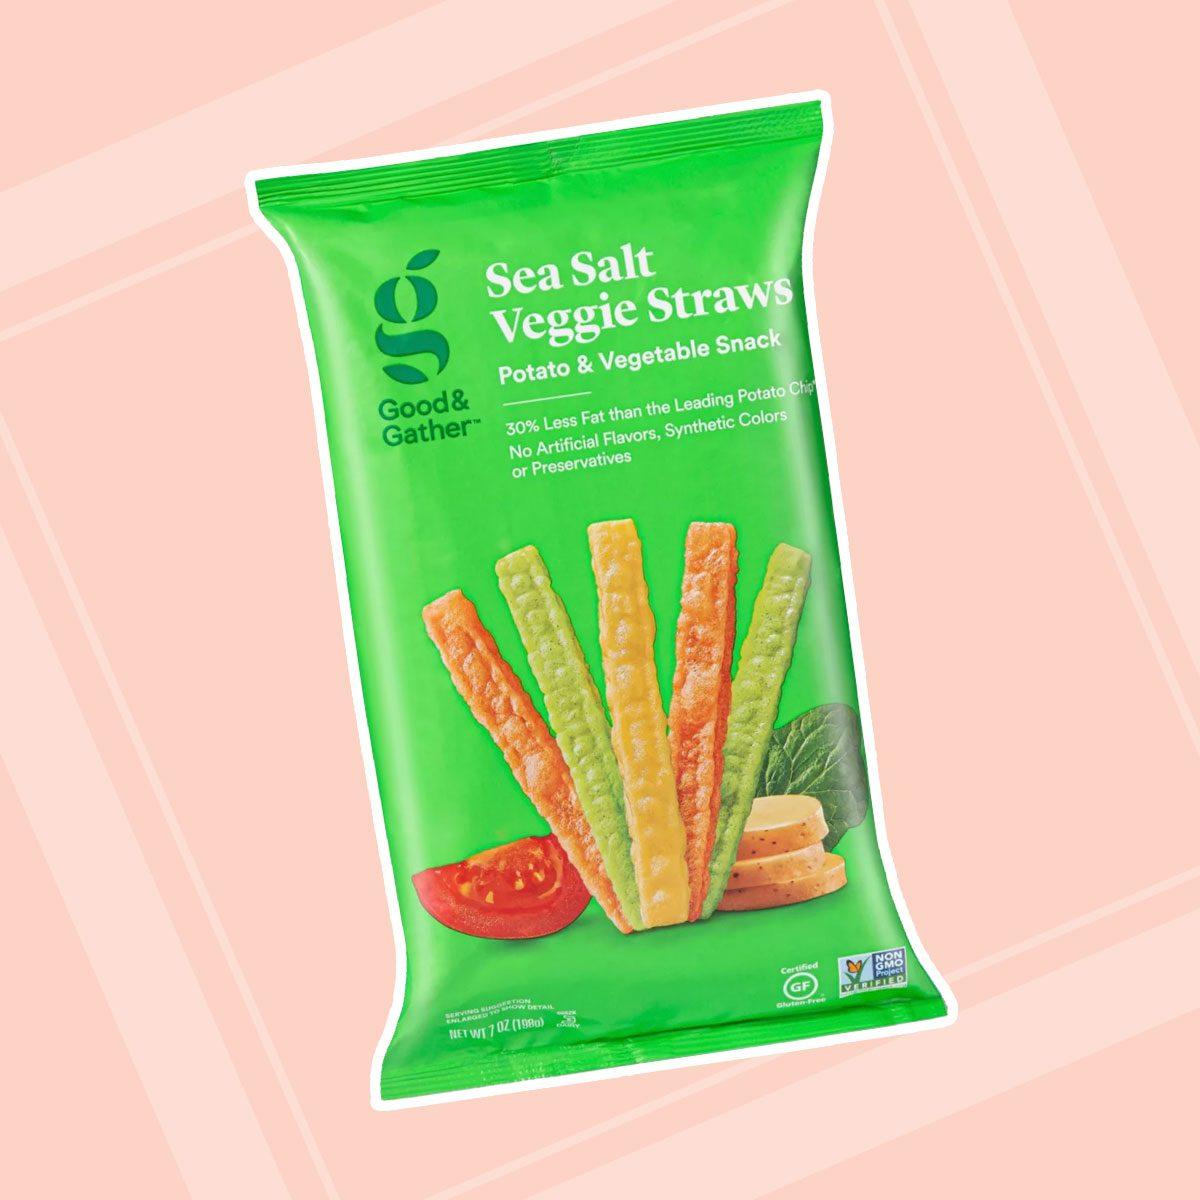 Sea Salt Veggie Straws - 7oz - Good & Gather™